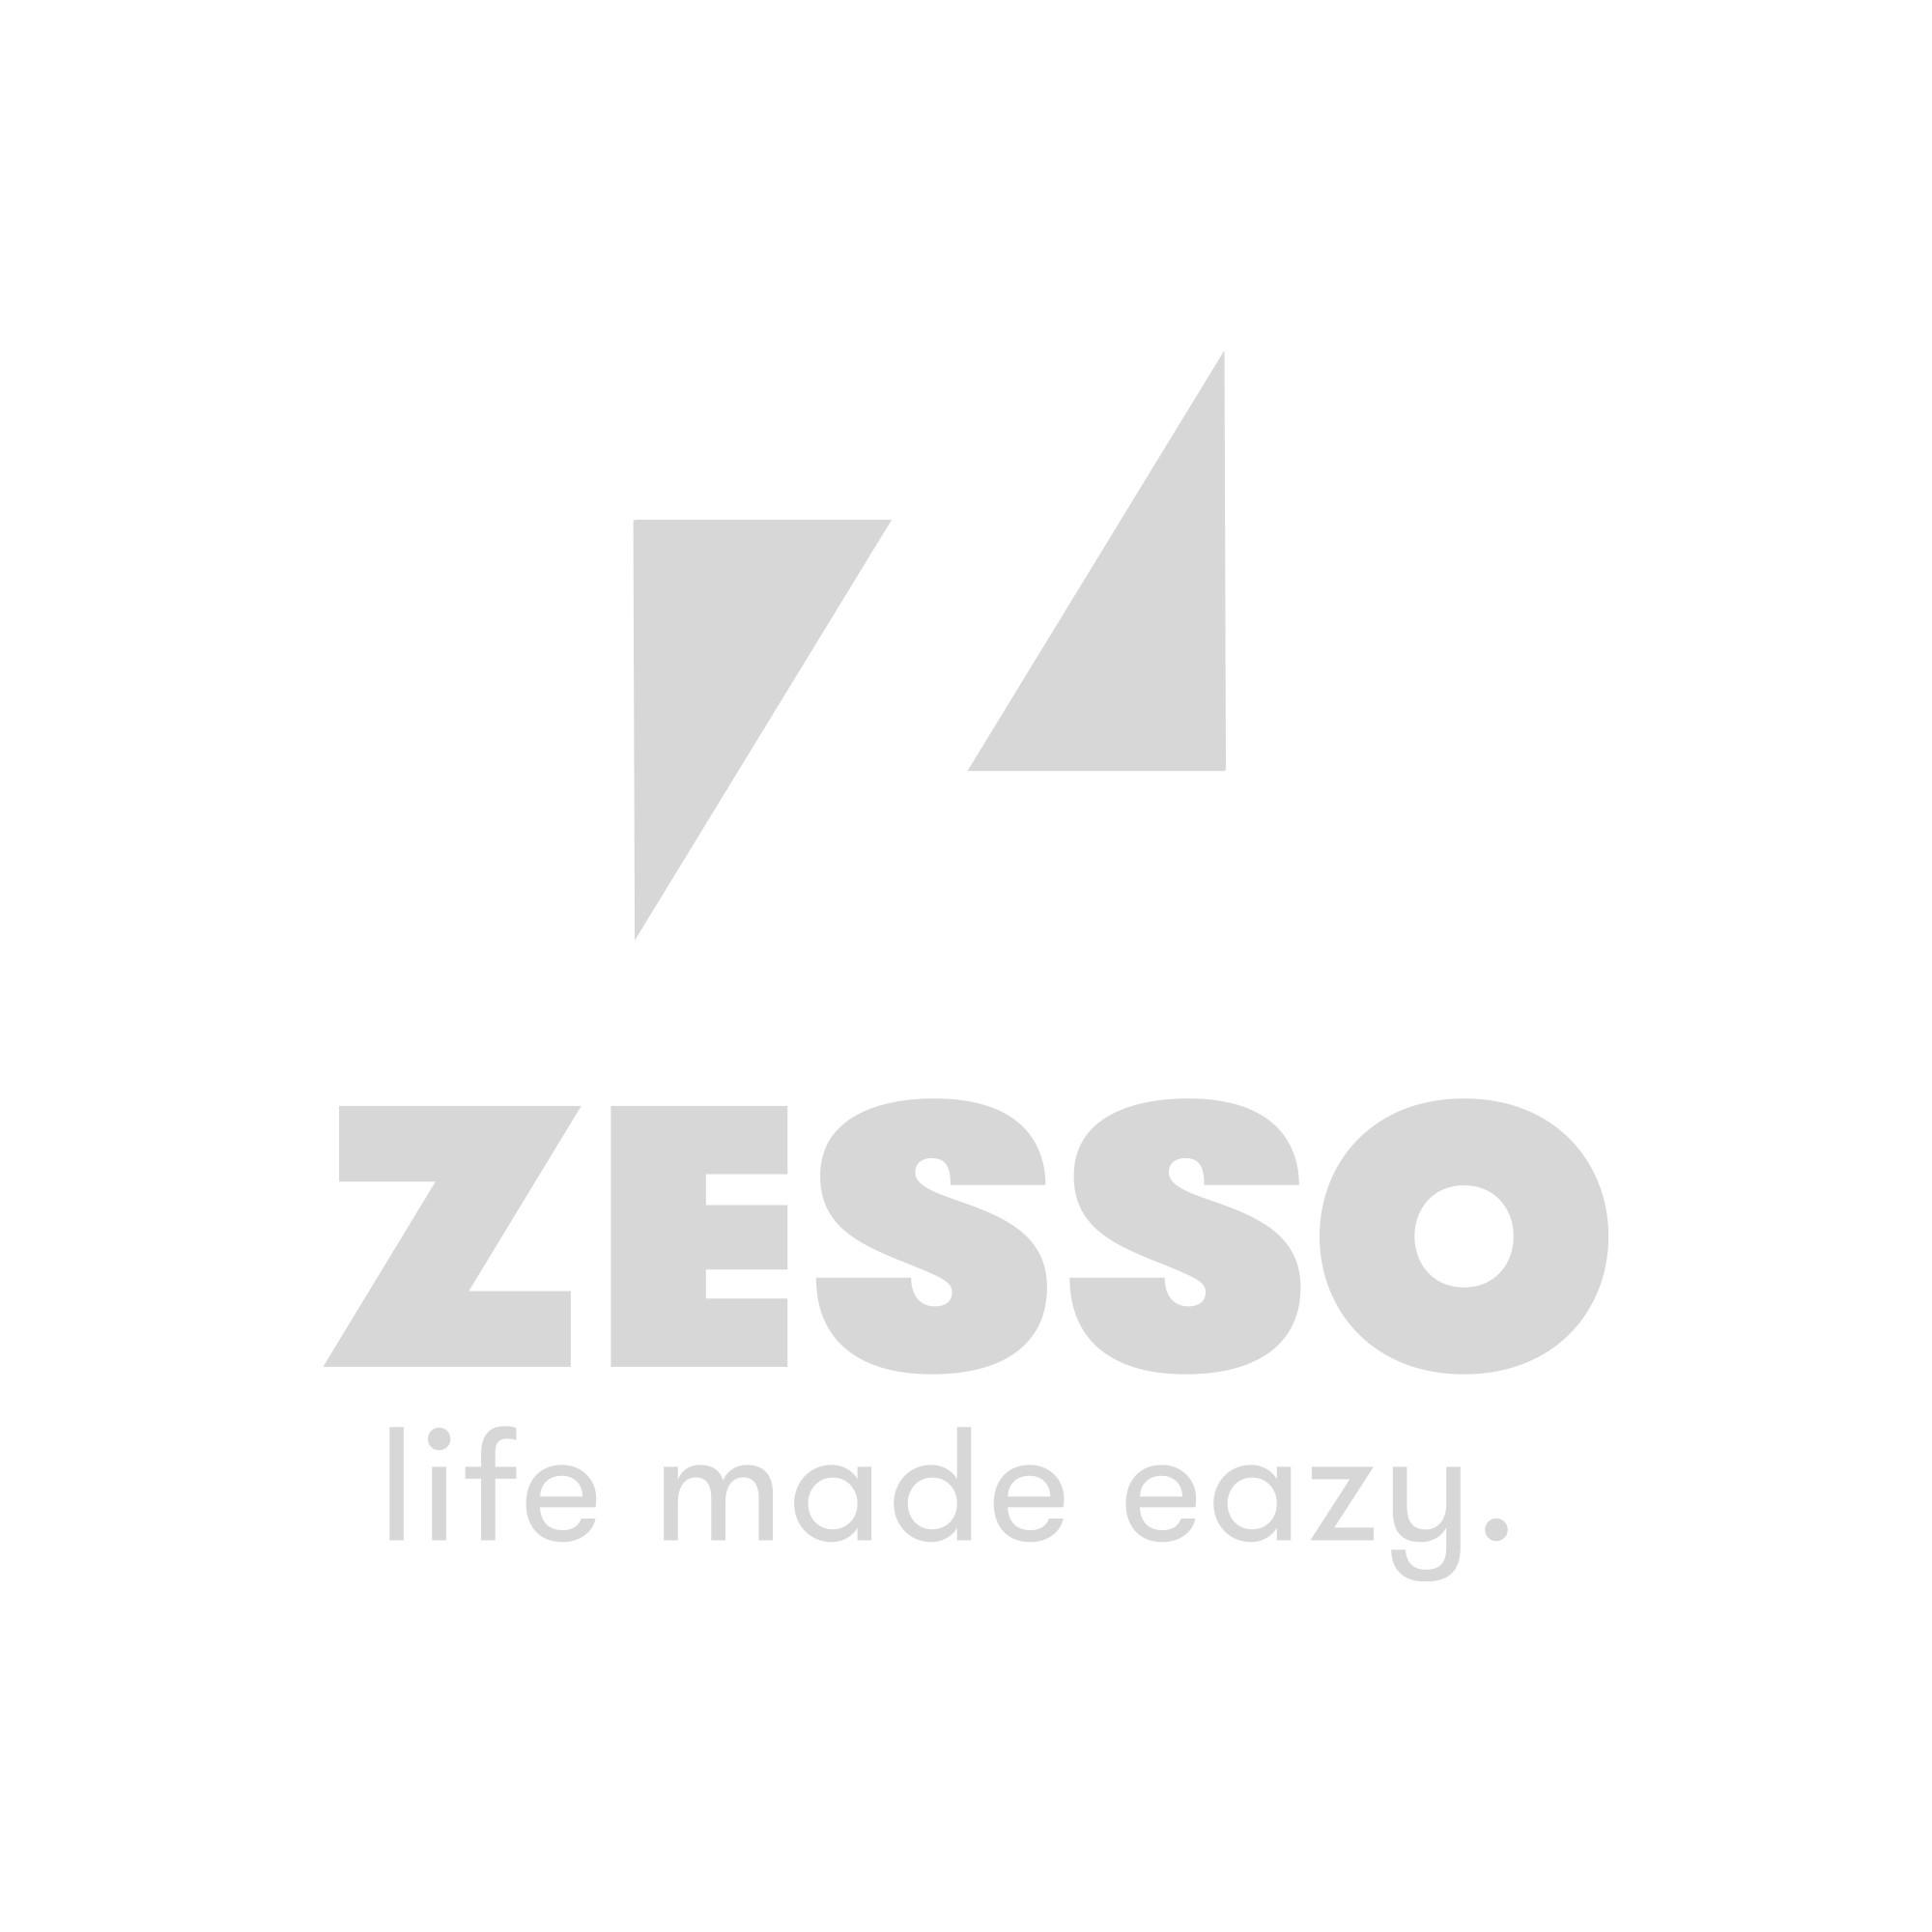 Reer Projectorlamp DreamBeam Wit